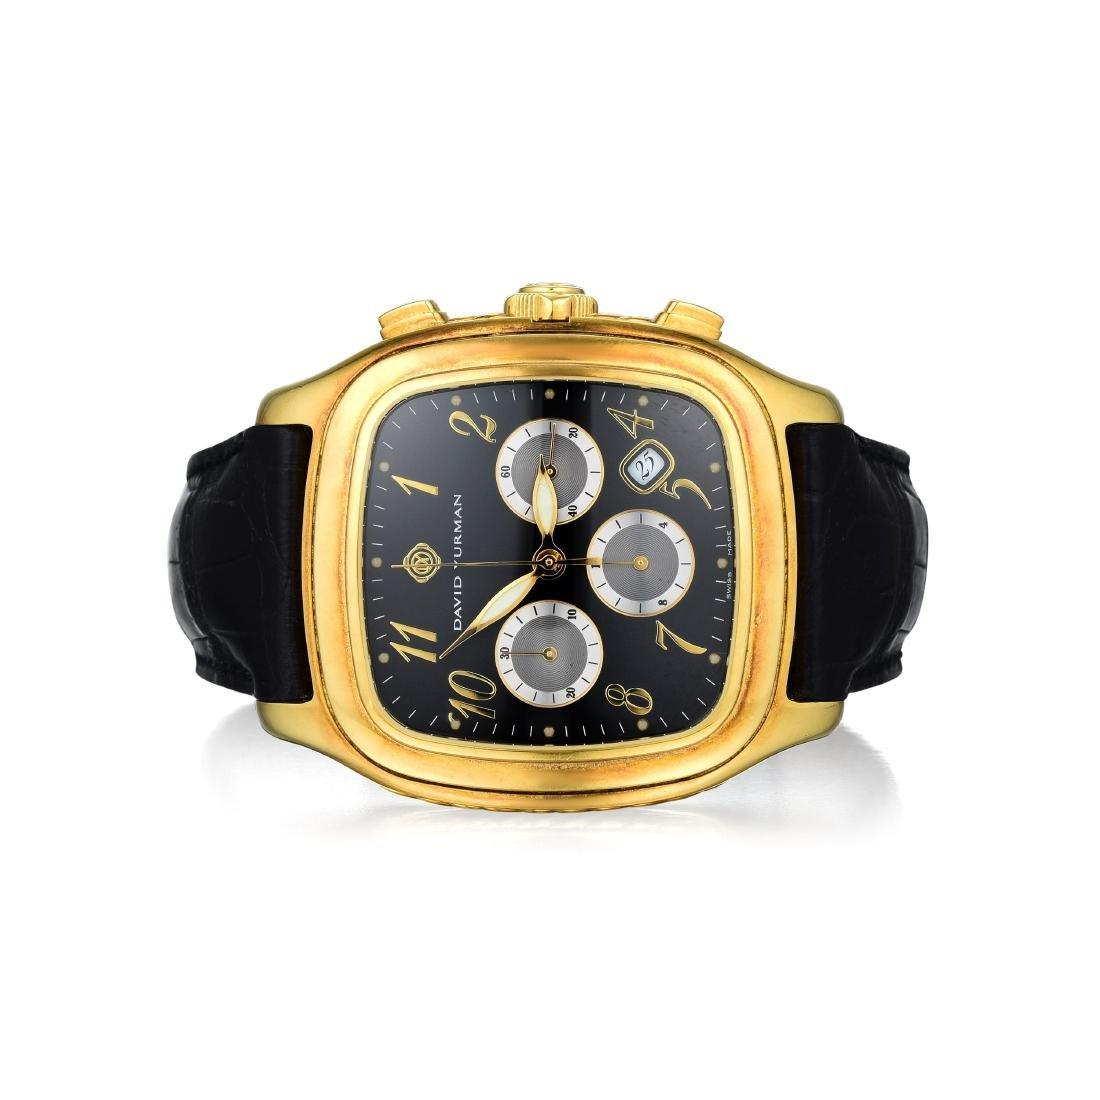 David Yurman Gents Gold Chronograph Timepiece